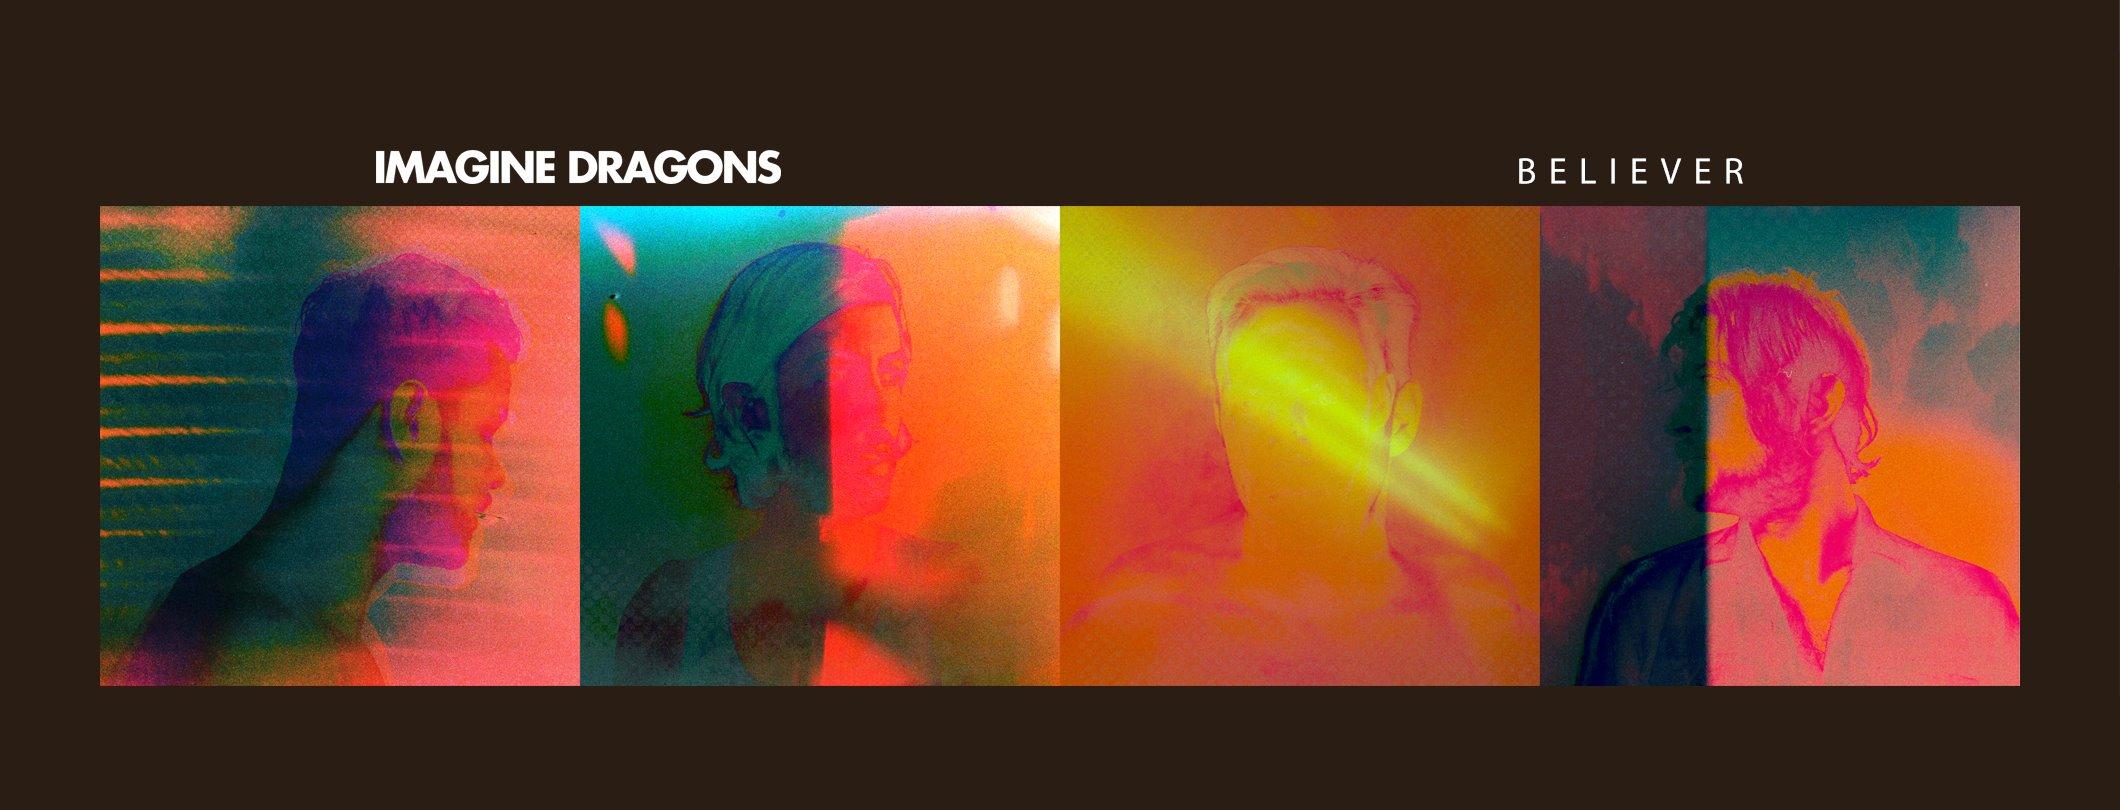 imagine_dragons_believer